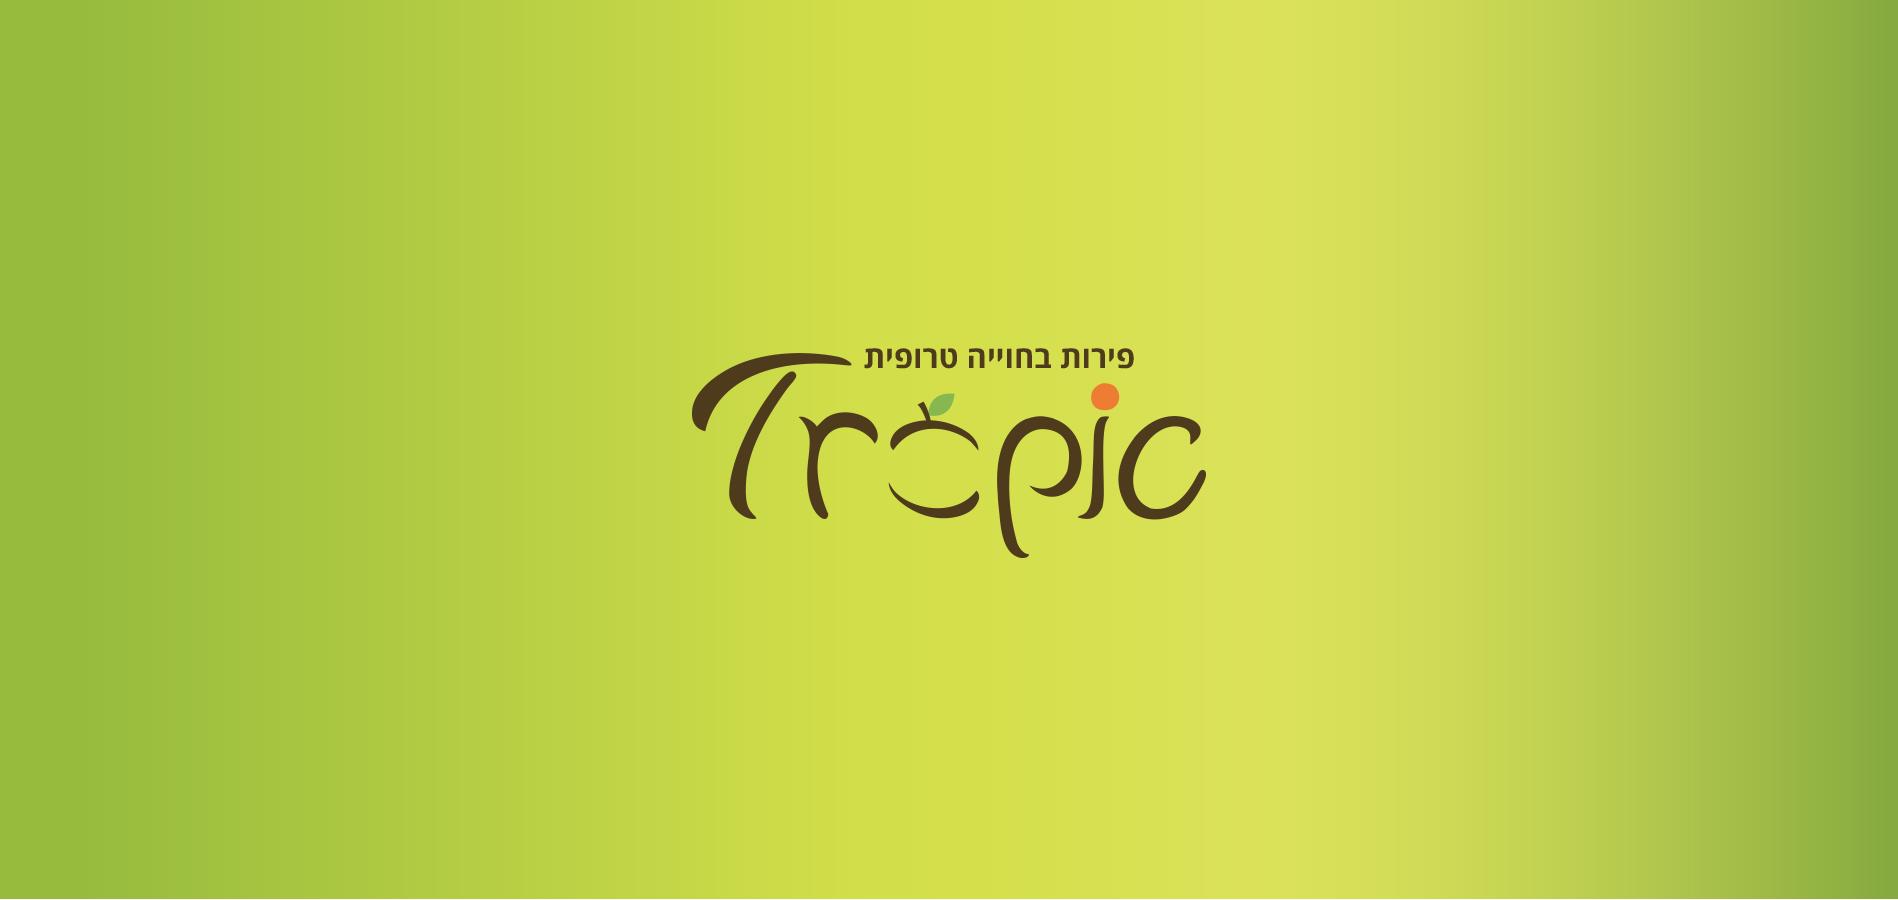 Tropic logo